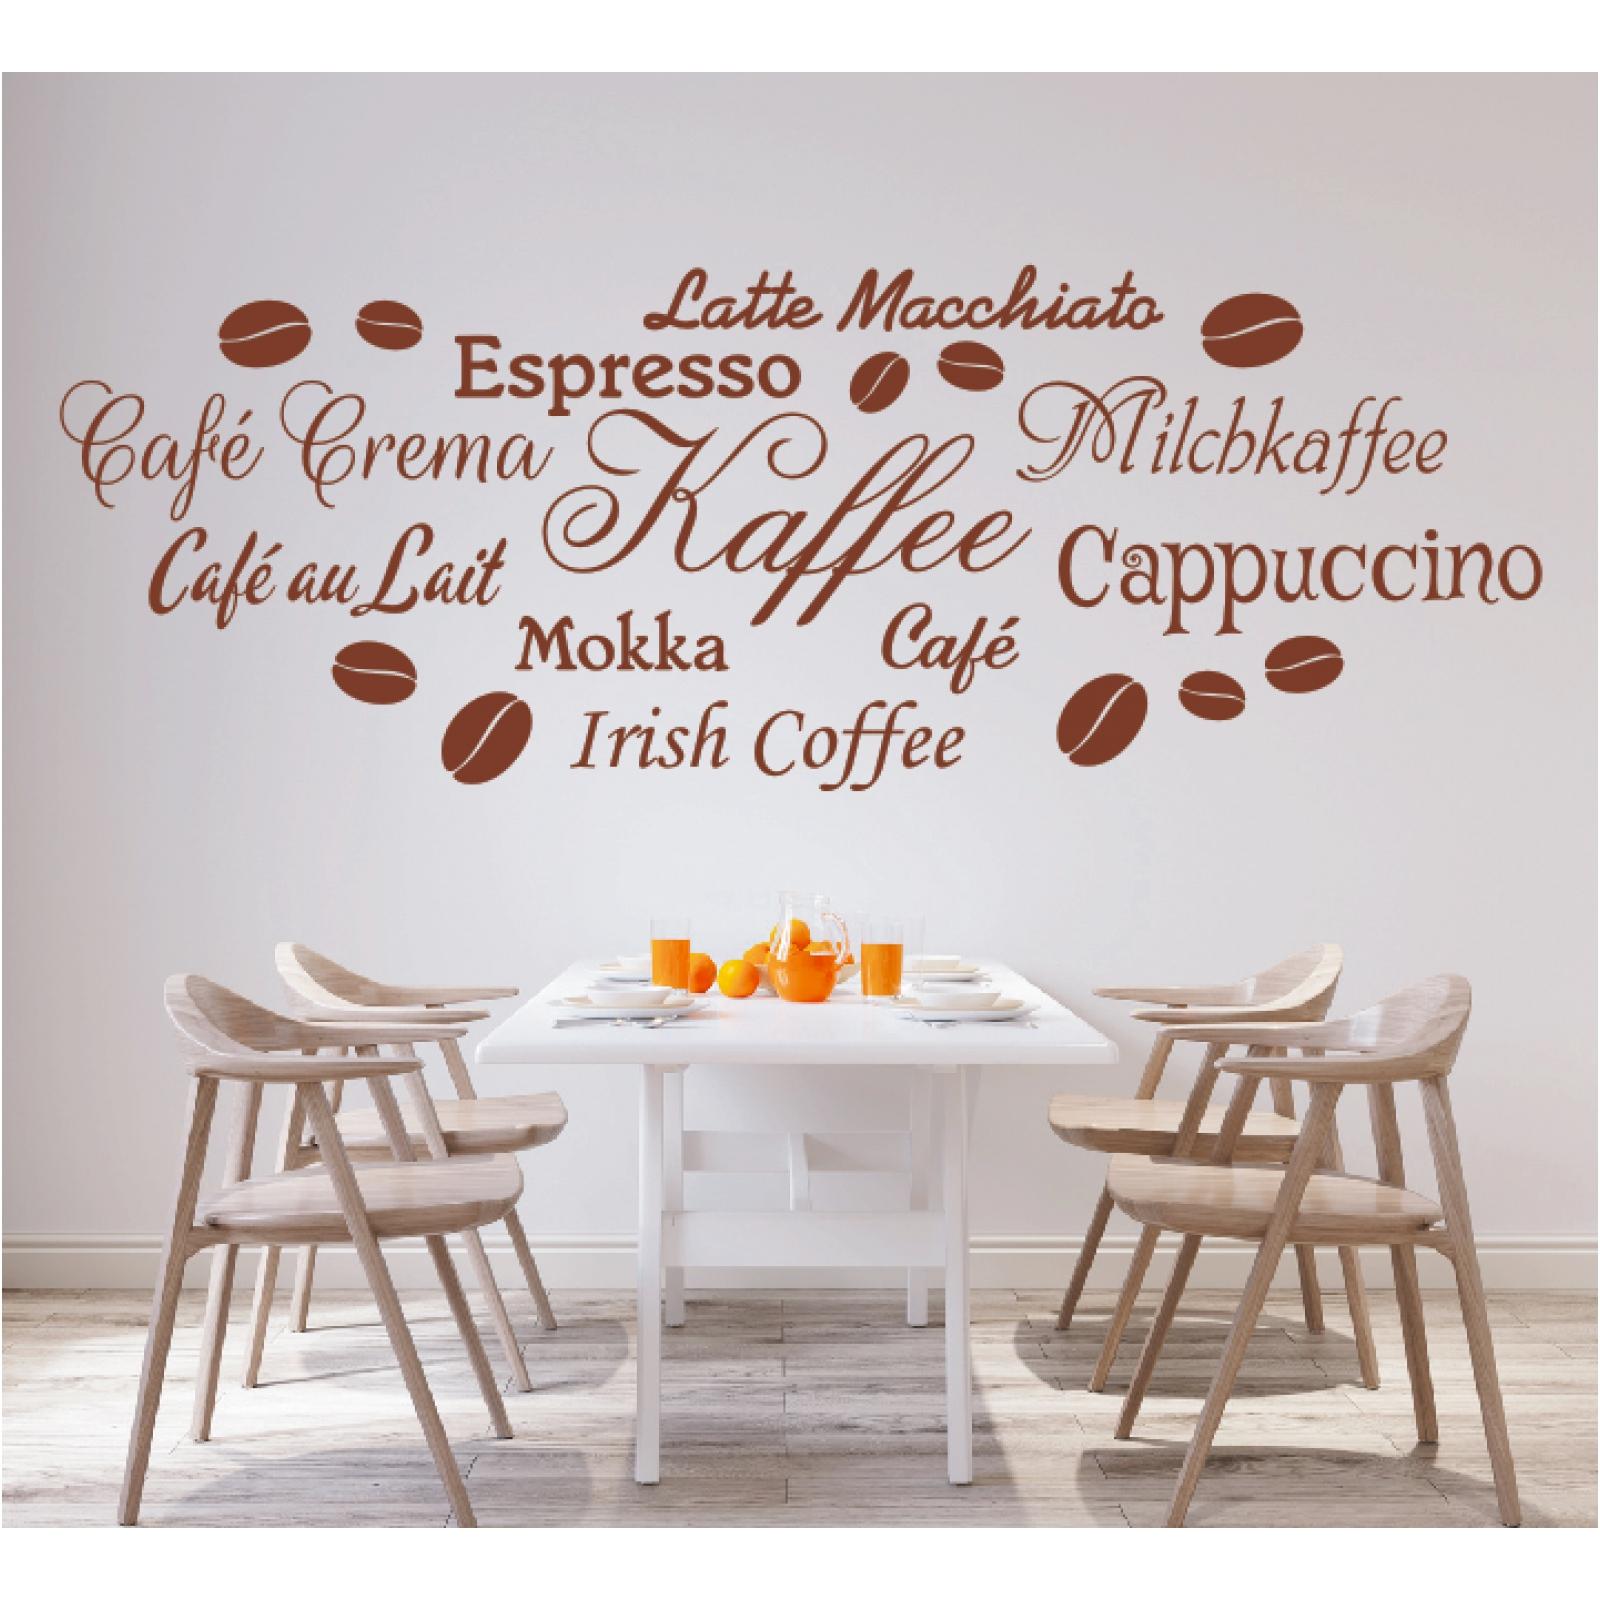 Wunderbar Perfekt Kaffee U2013 Latte Macchiato, Milchkaffee, Cappuccino, Espresso,  Café Au Lait,